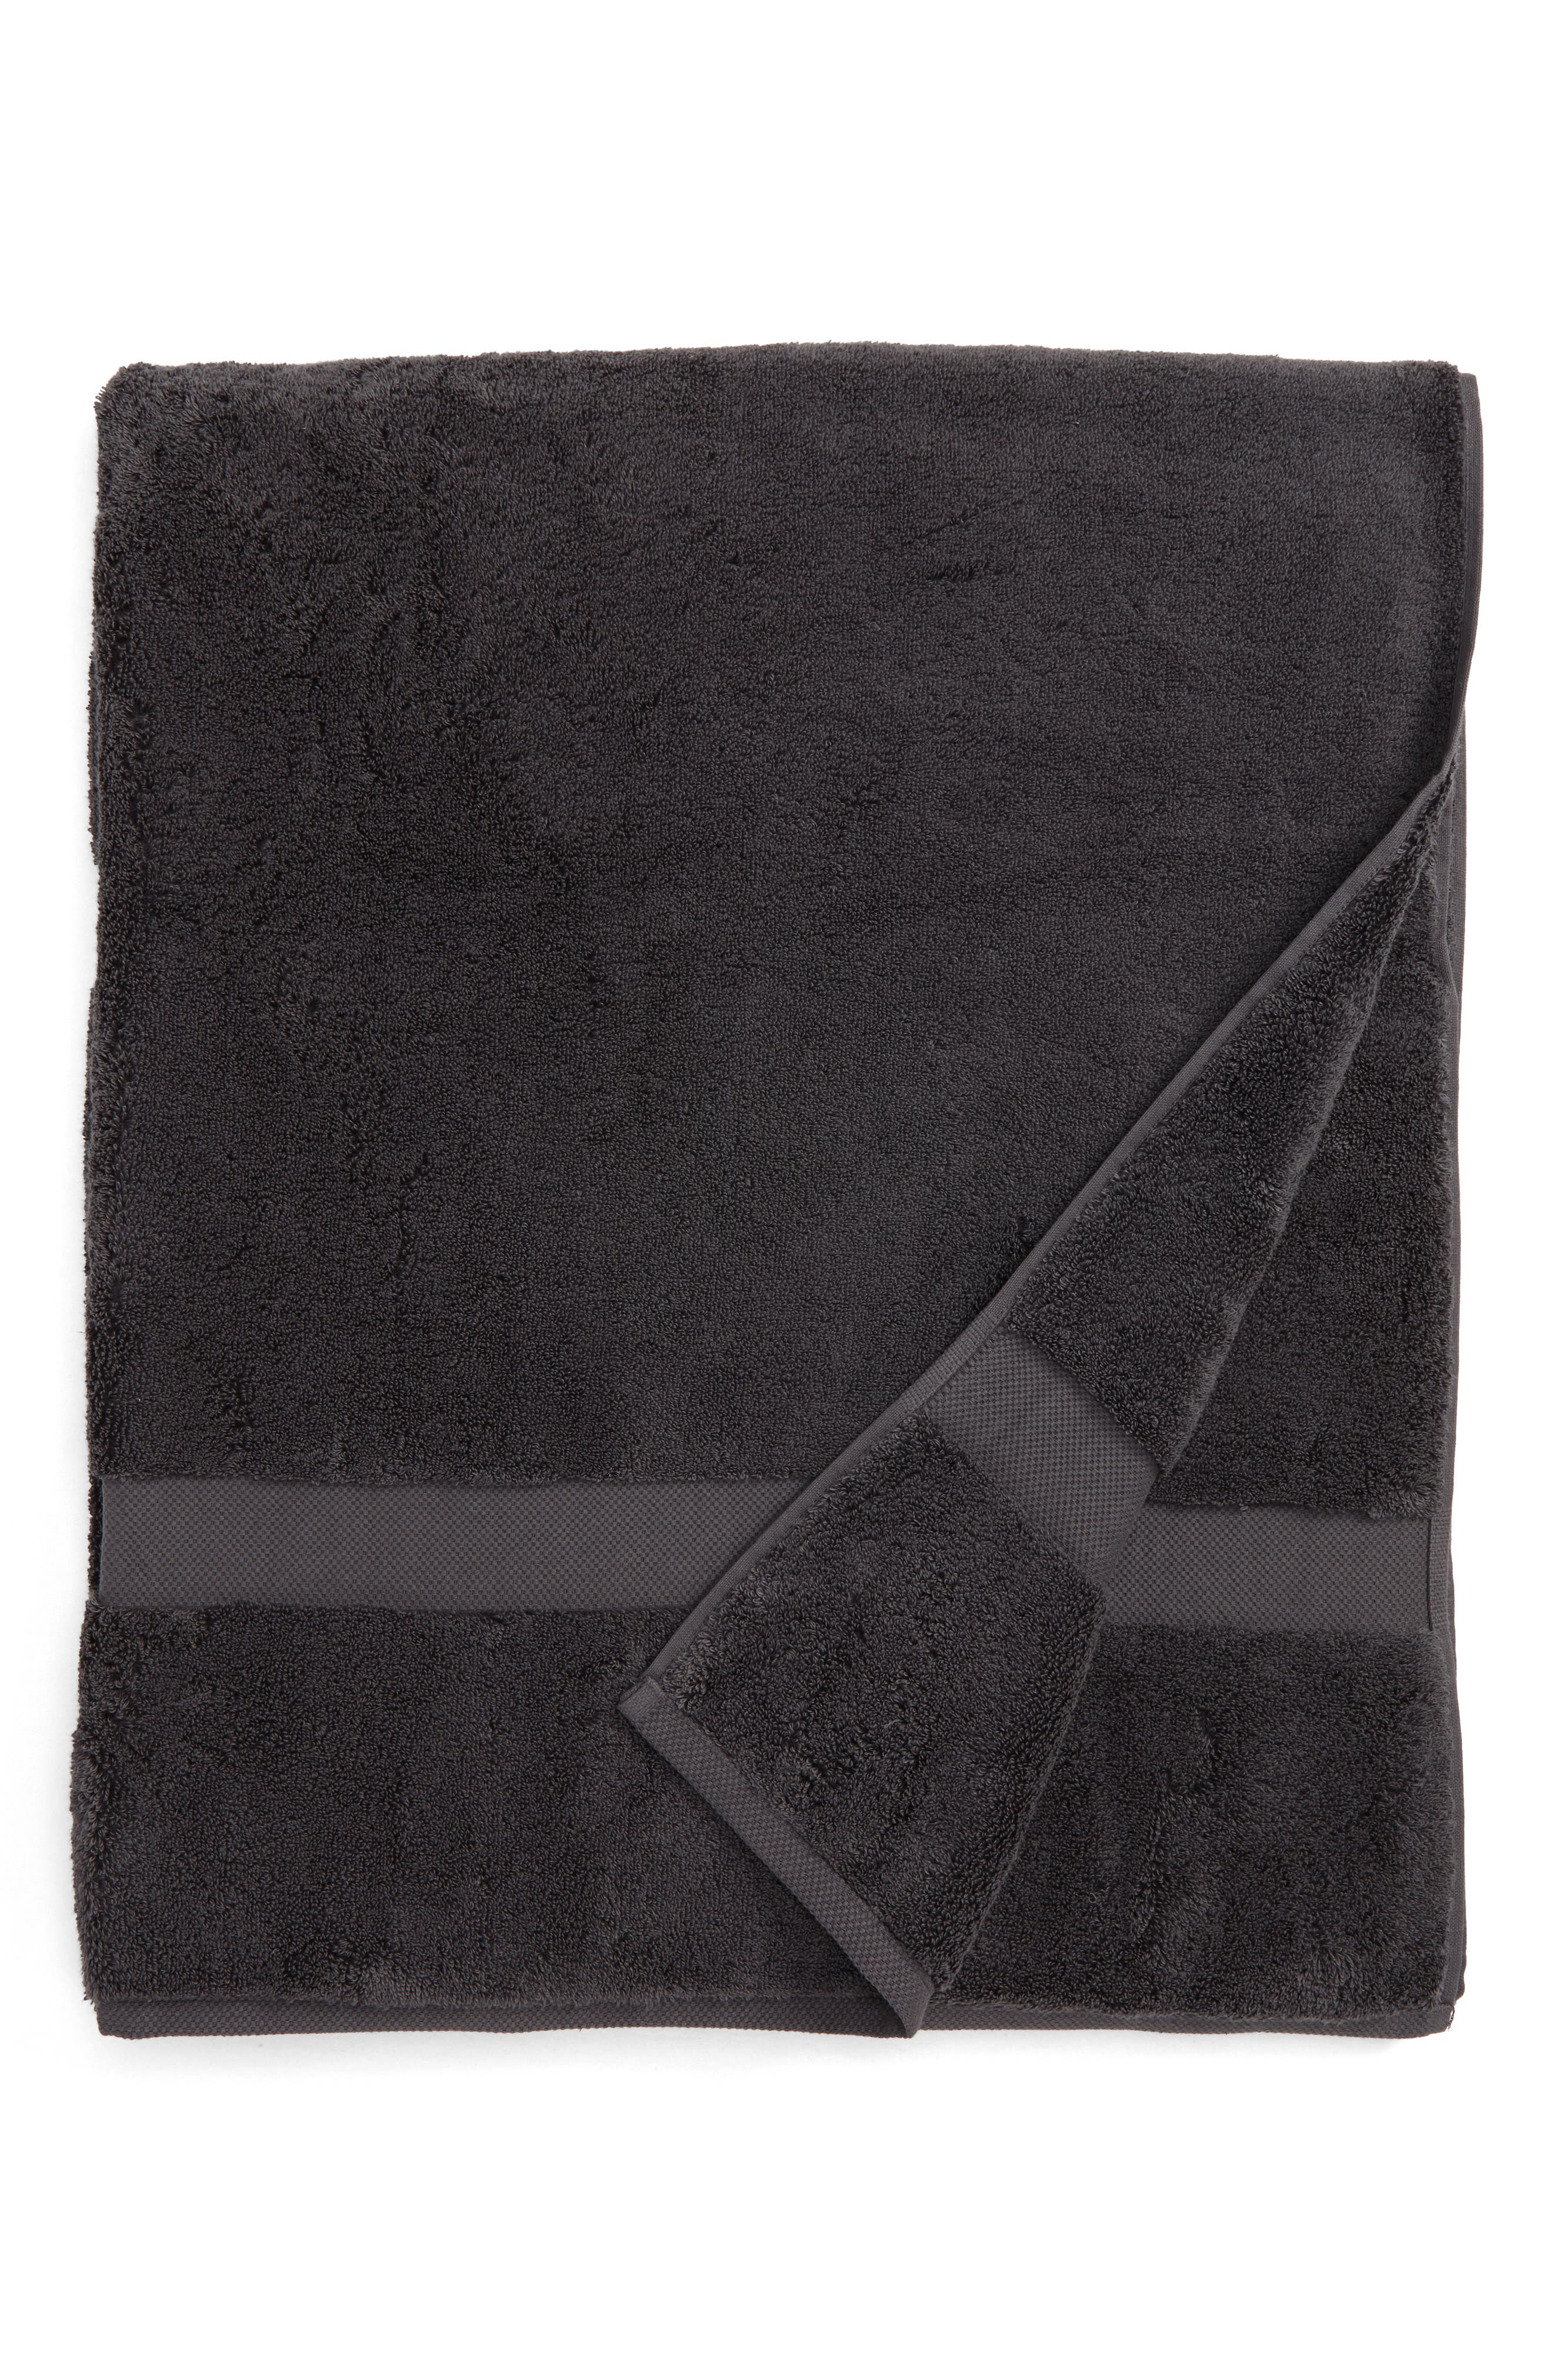 Alternate Image 1 Selected - Matouk Lotus Bath Sheet